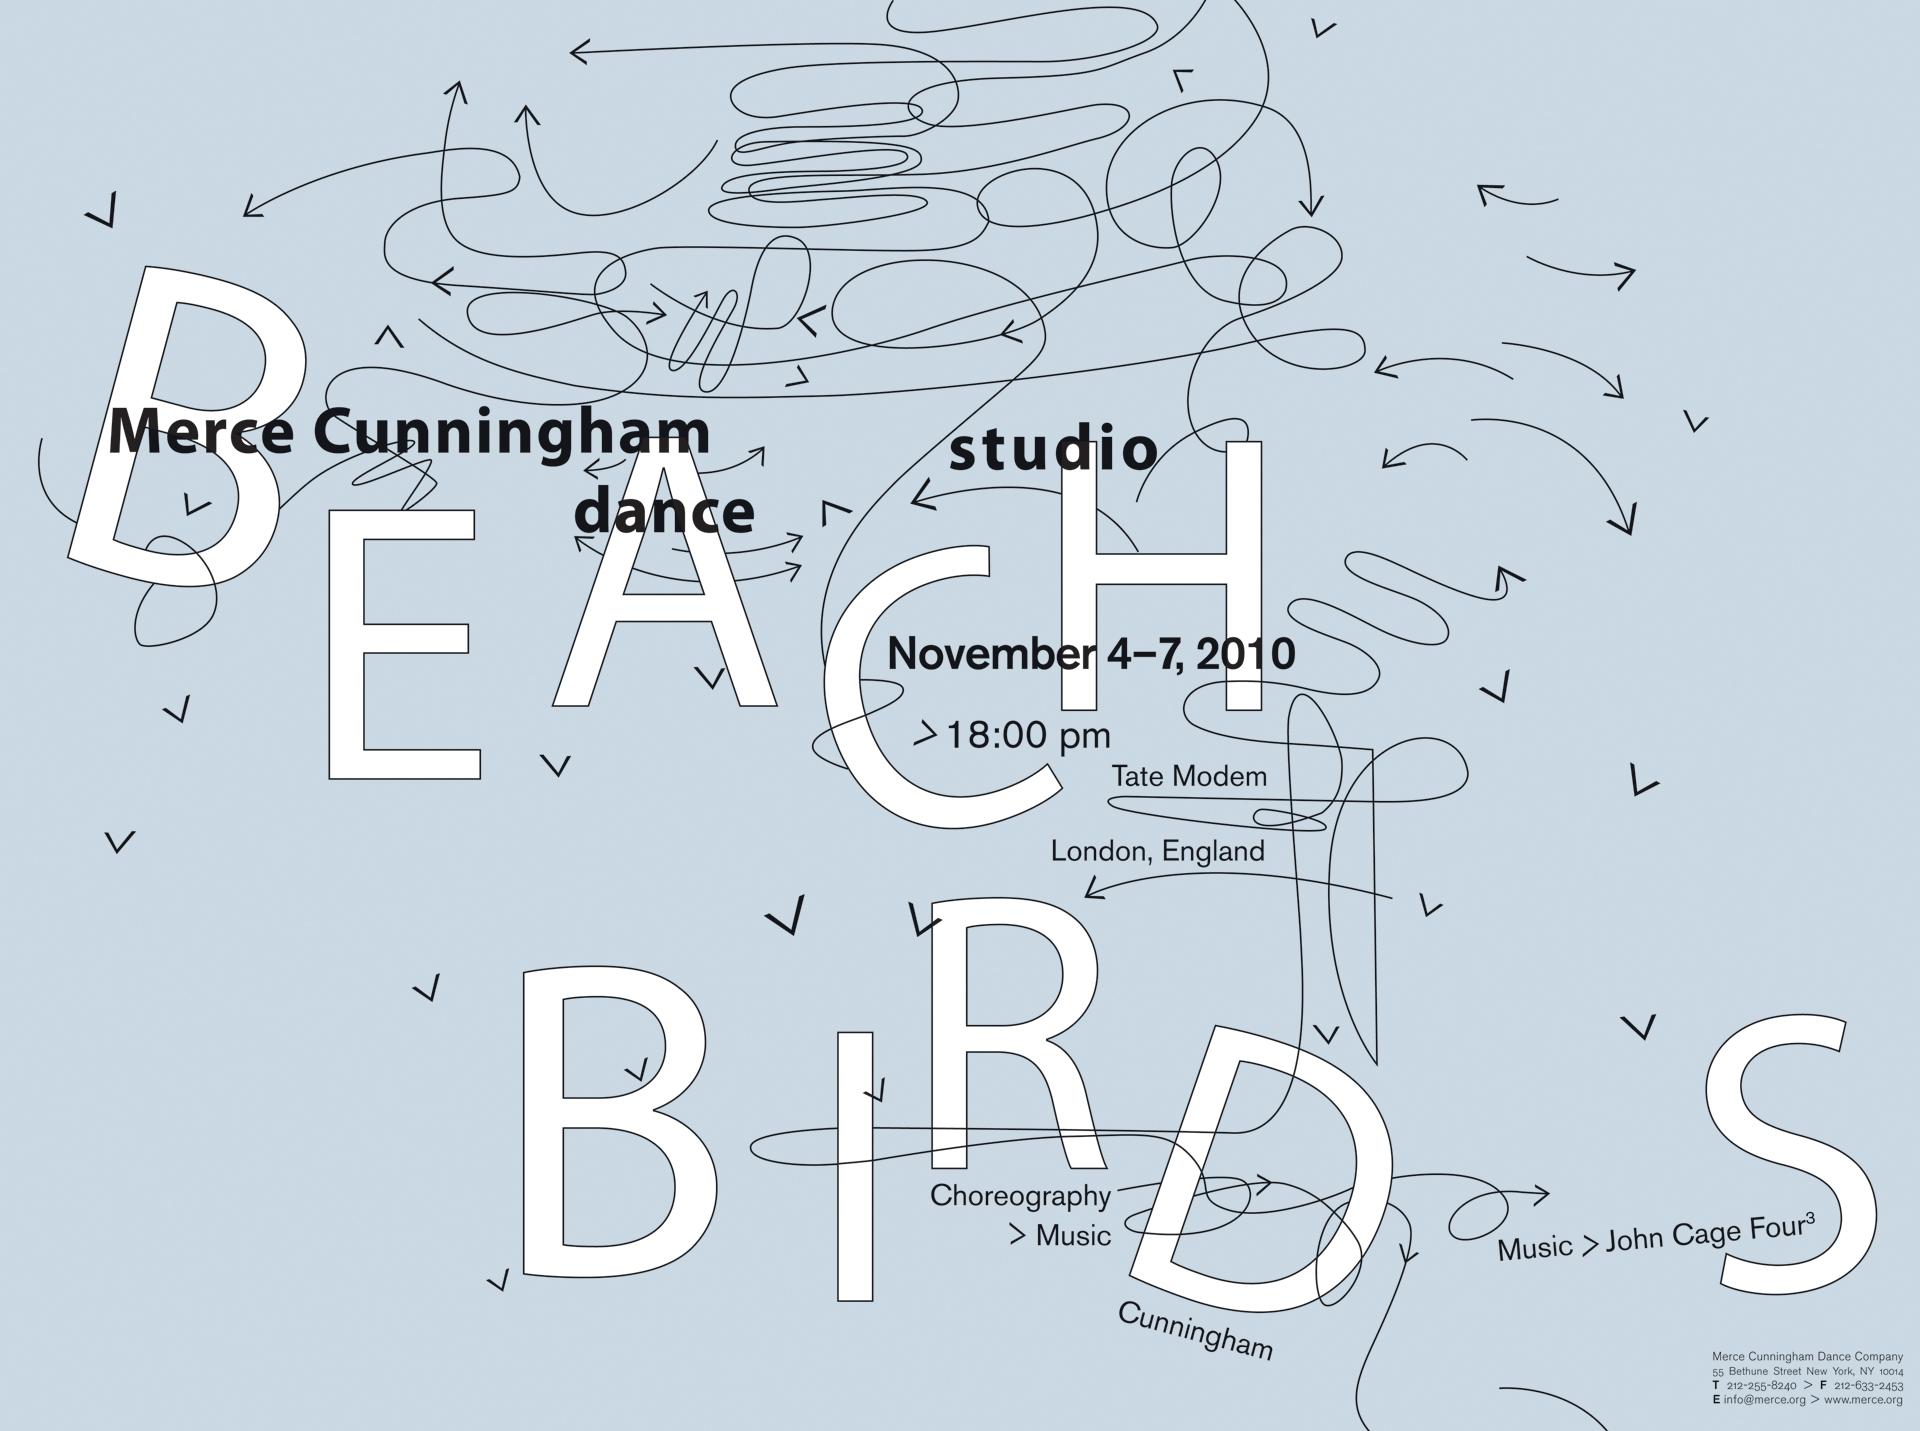 Merce Cunningham dance studio poster